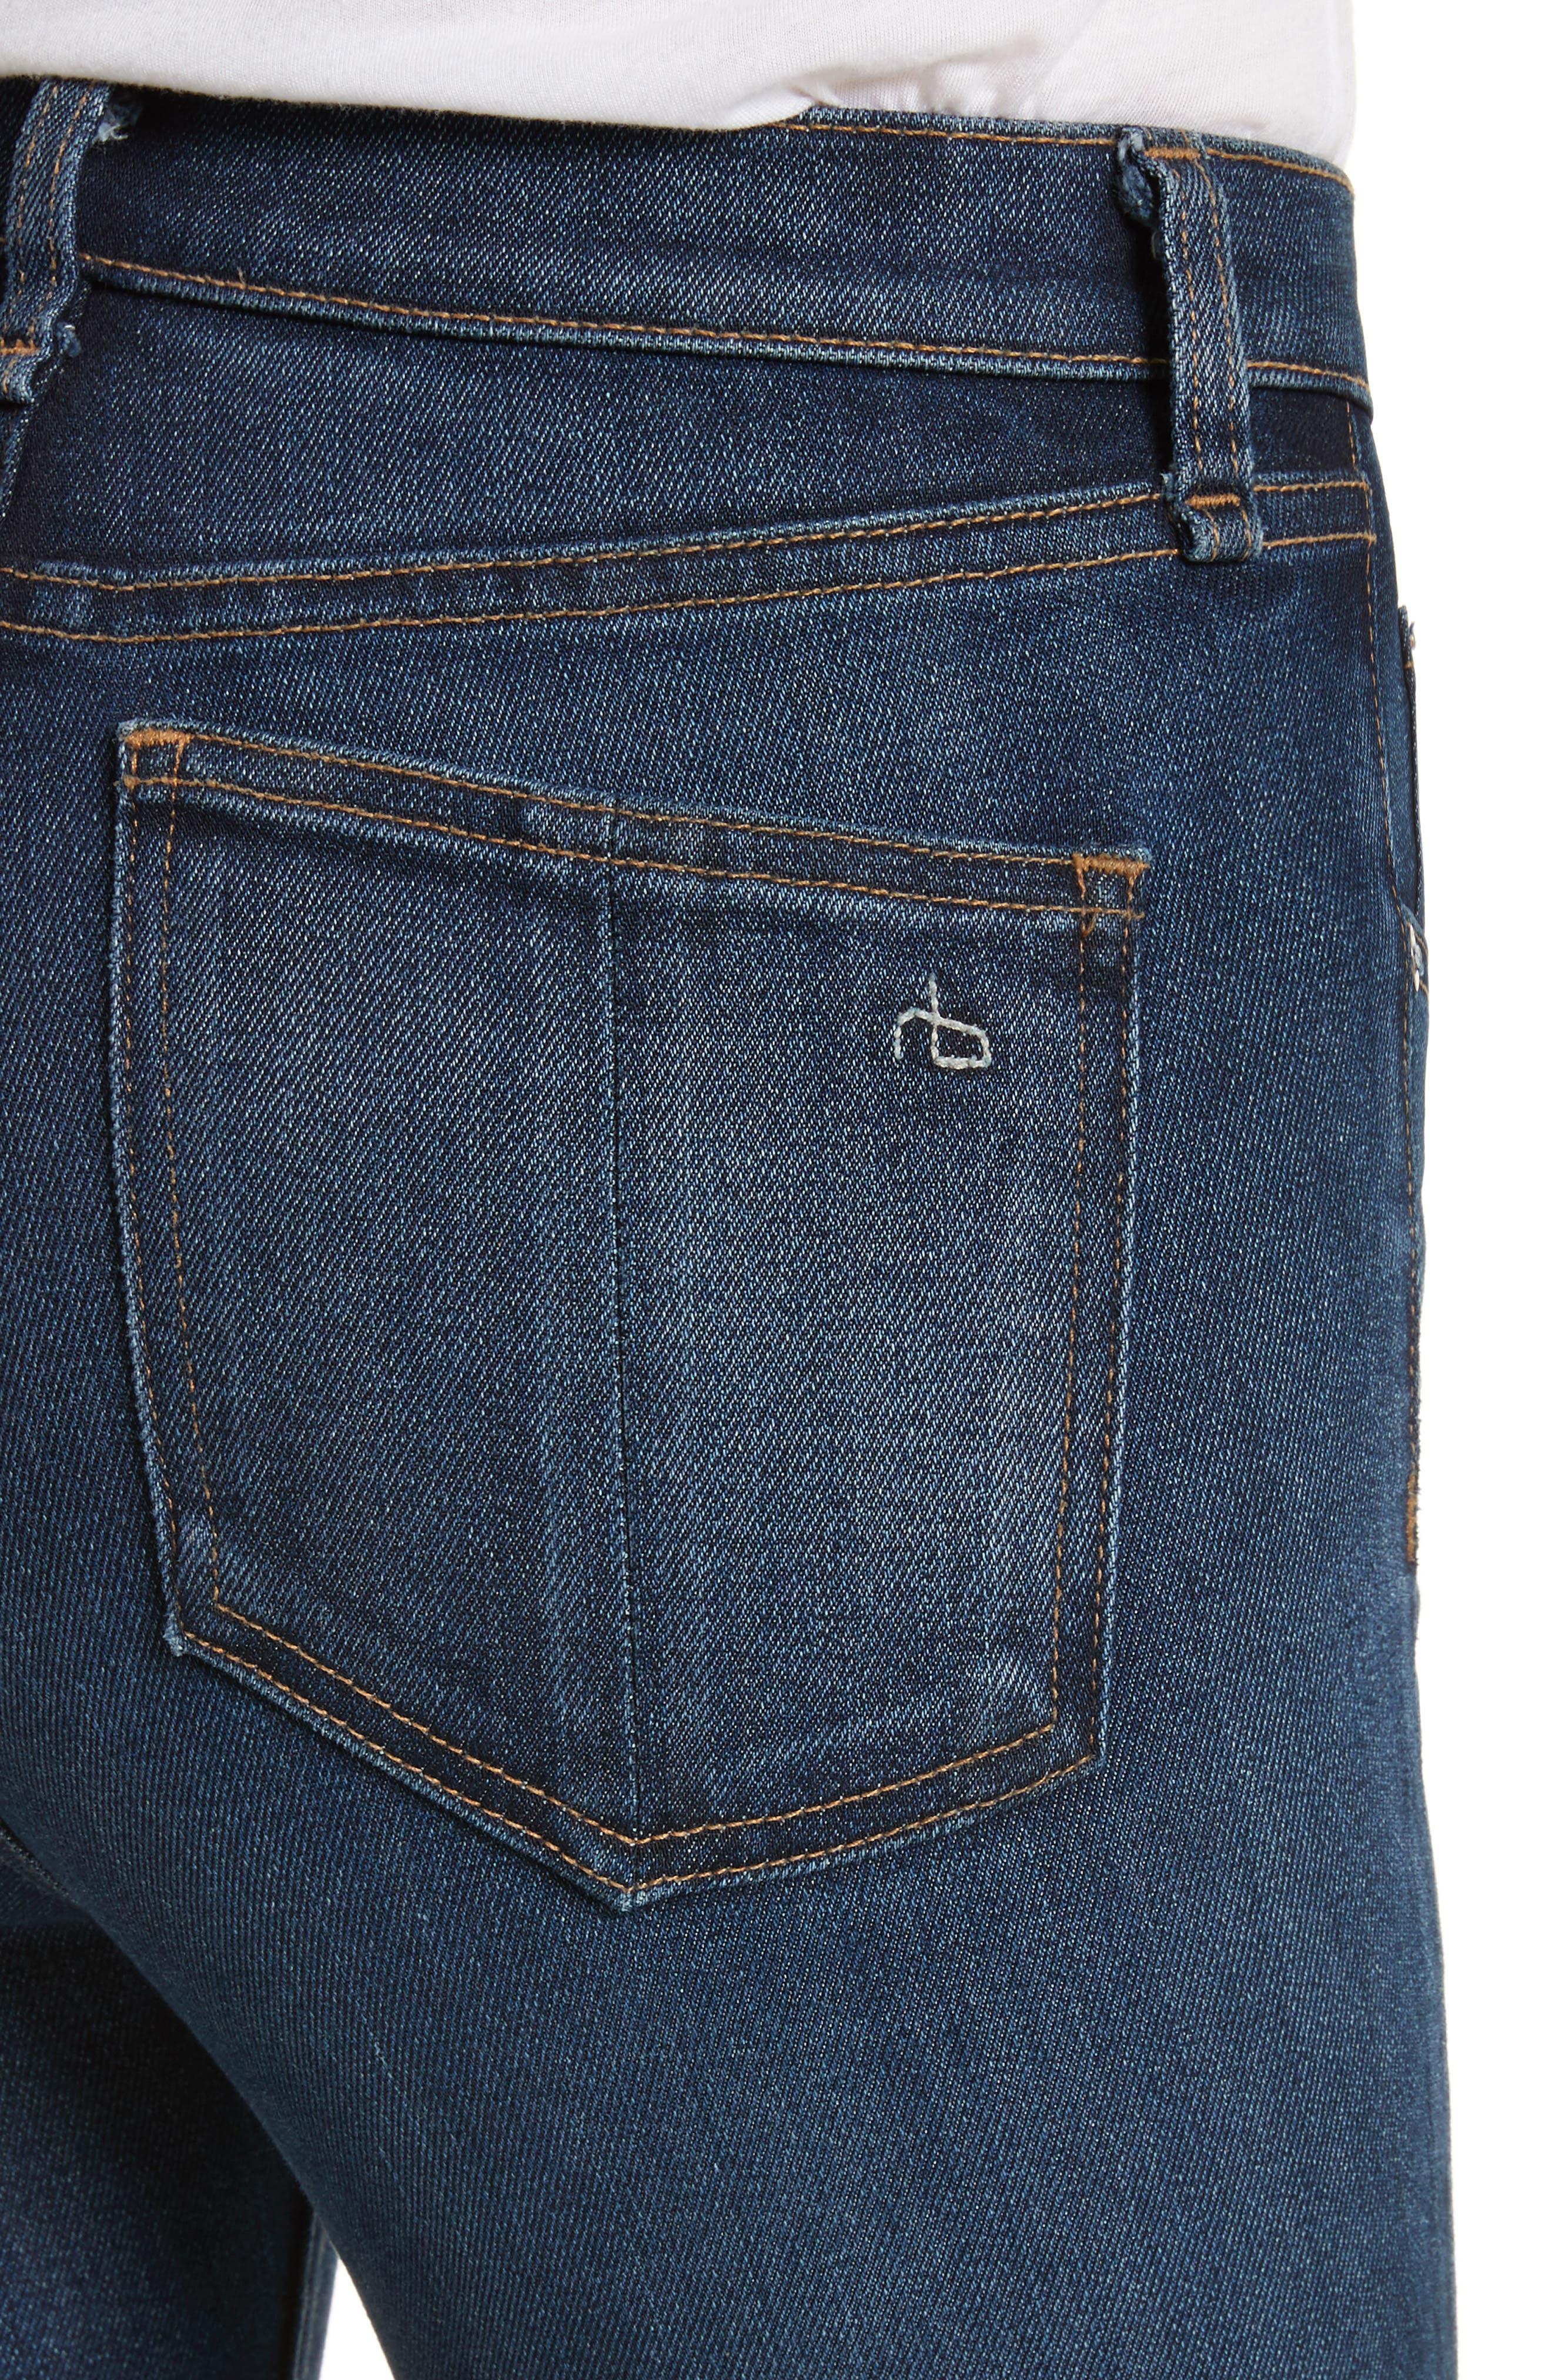 High Waist Skinny Jeans,                             Alternate thumbnail 4, color,                             404